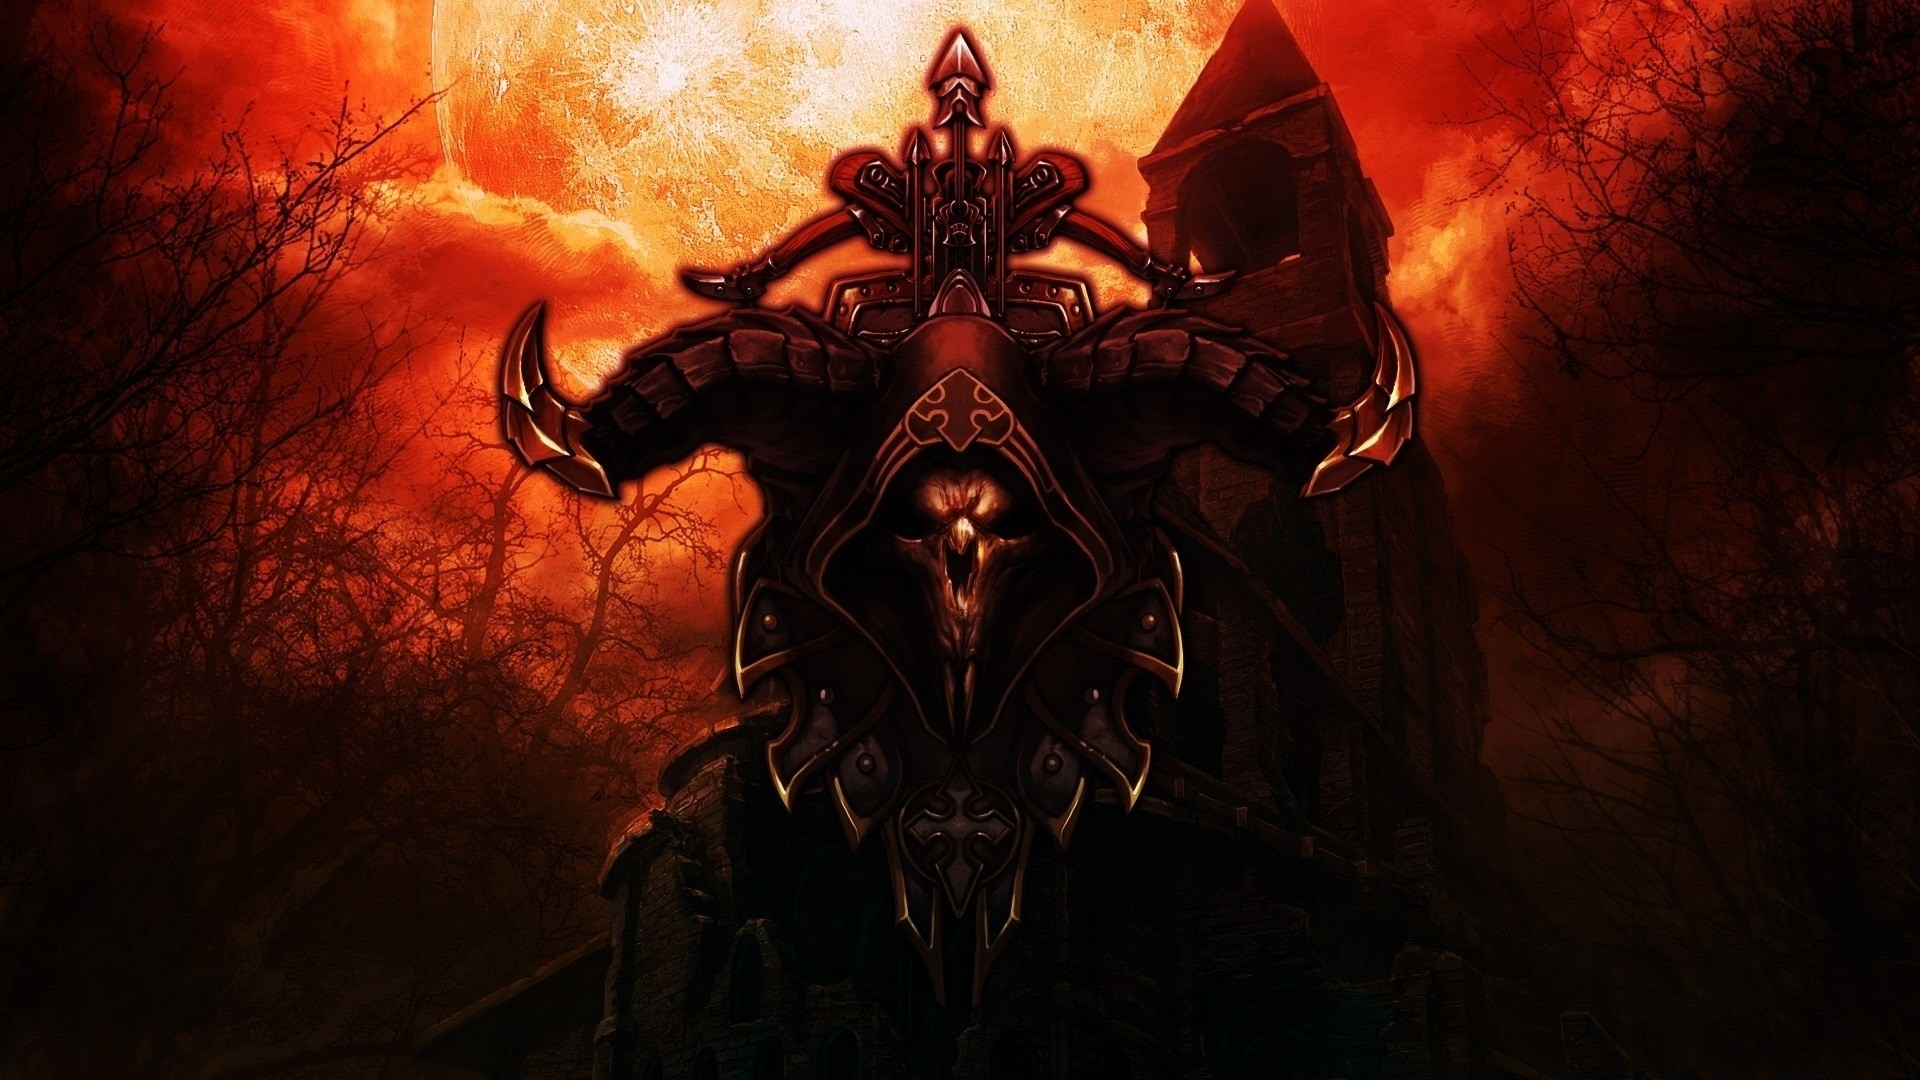 Demon Hunter screen wallpaper